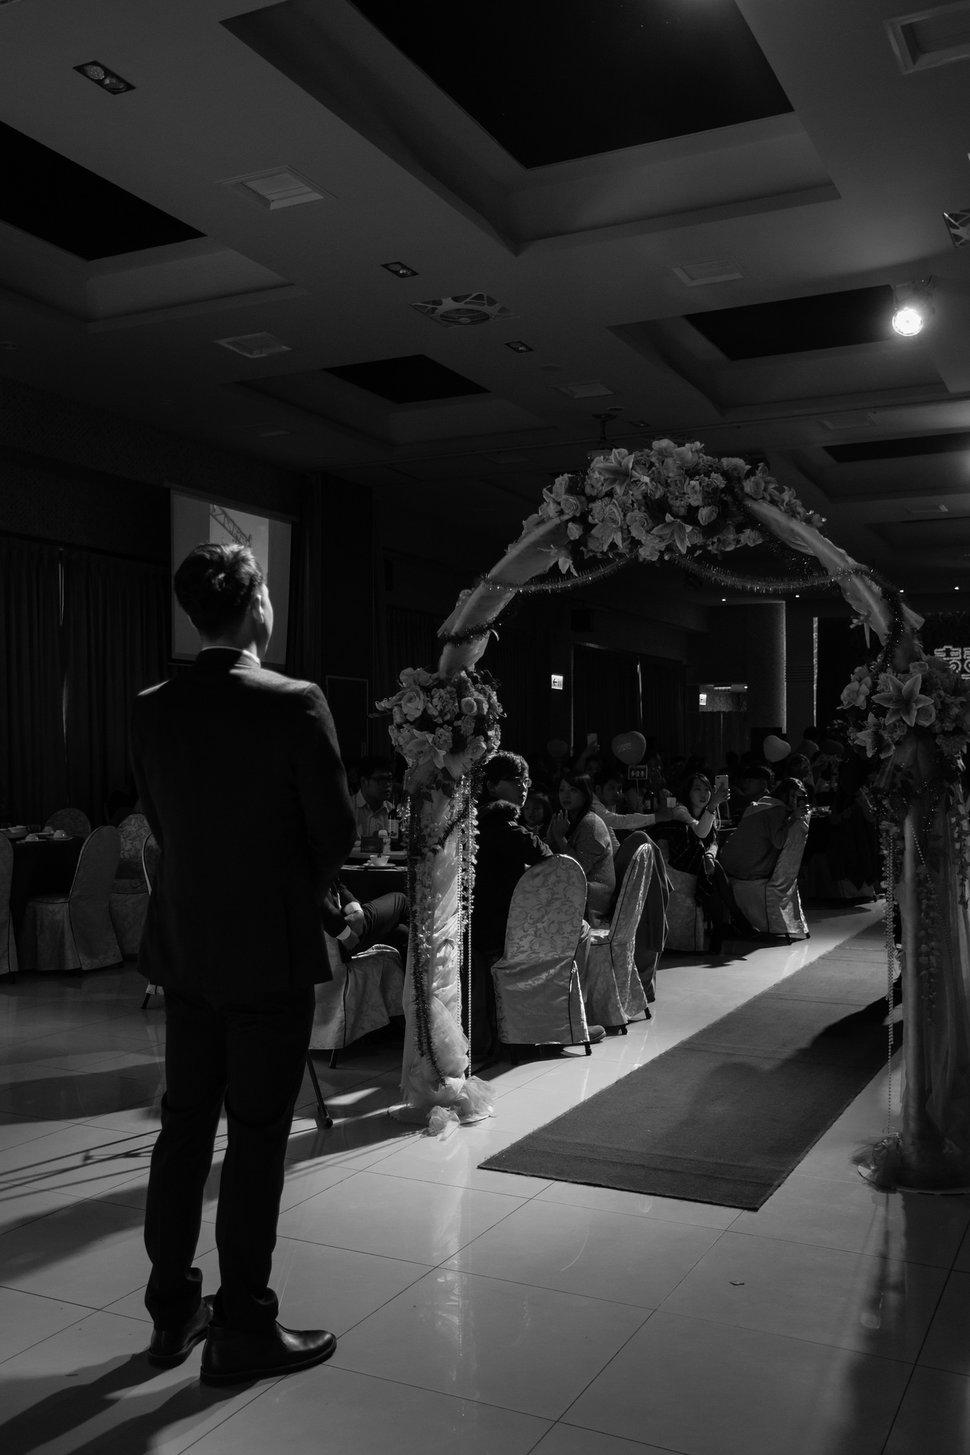 38098135675_6940f340c1_k - J Photographer《結婚吧》